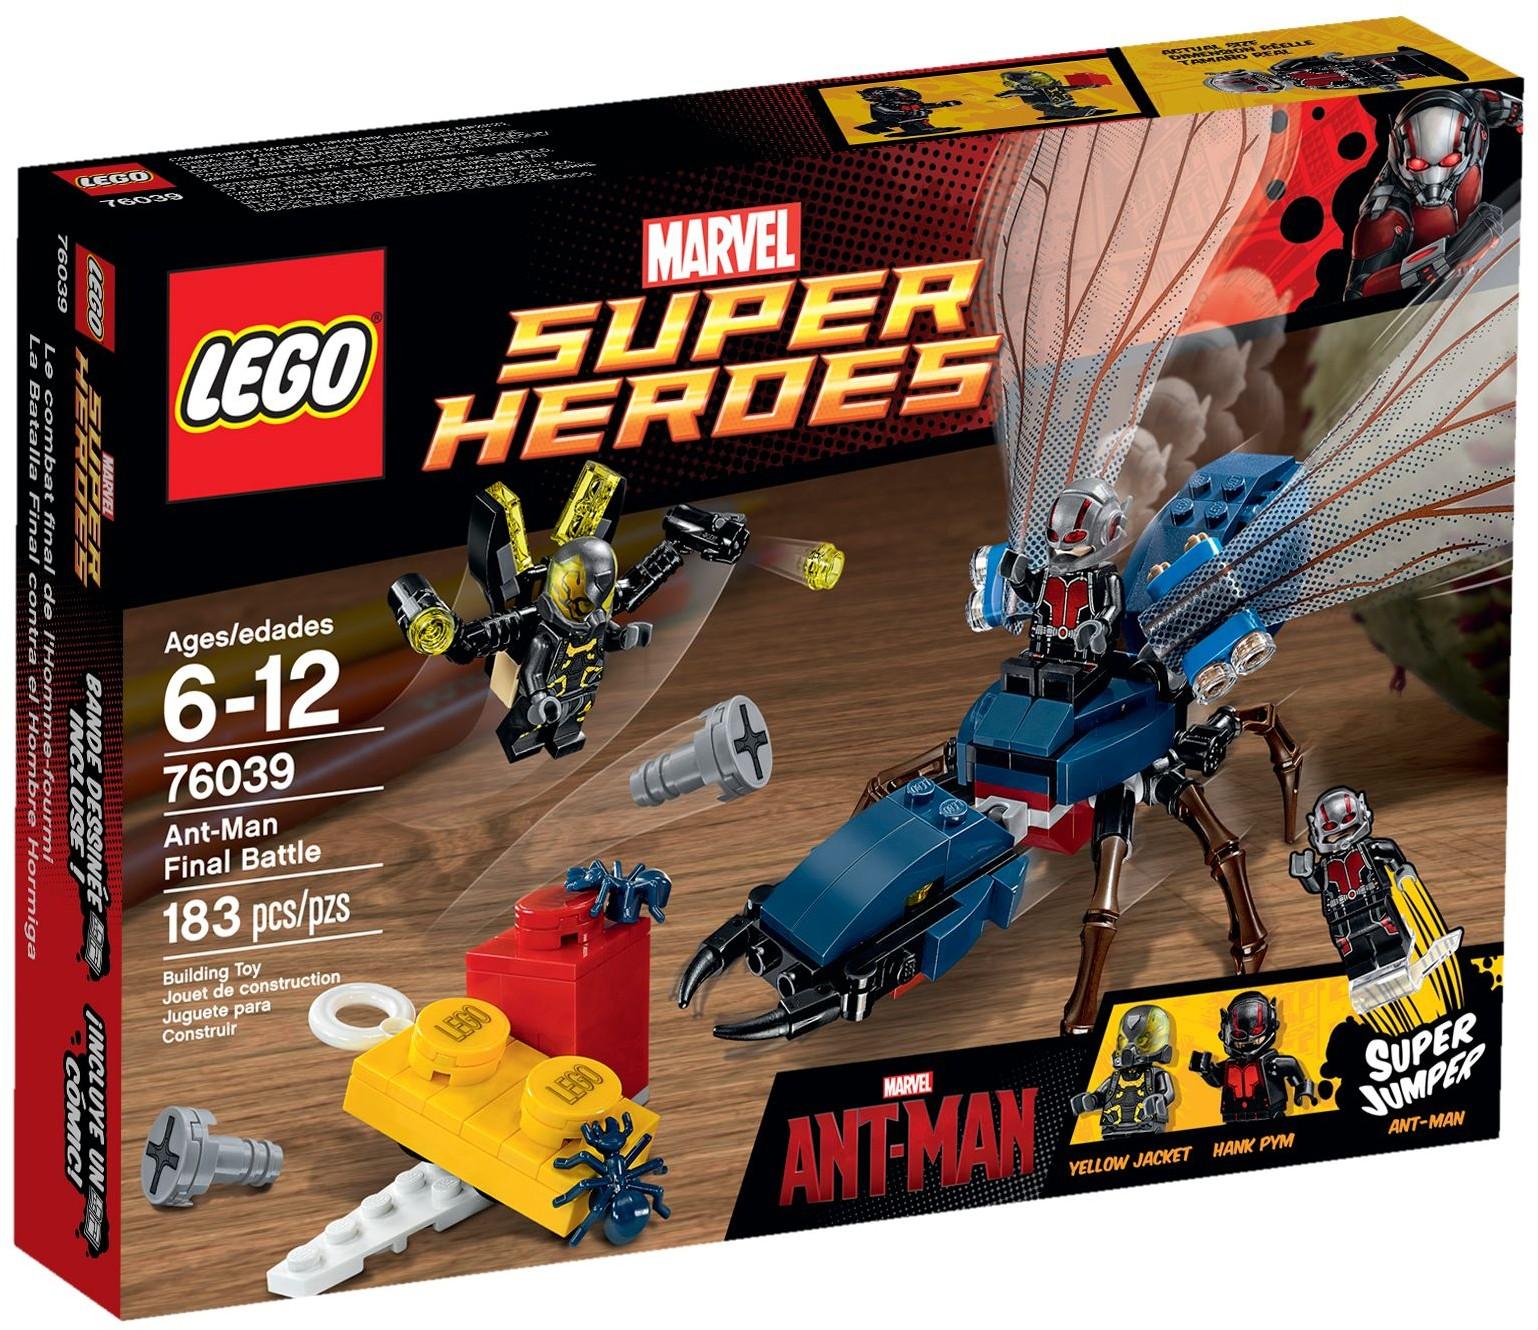 76039 Ant-Man Final Battle